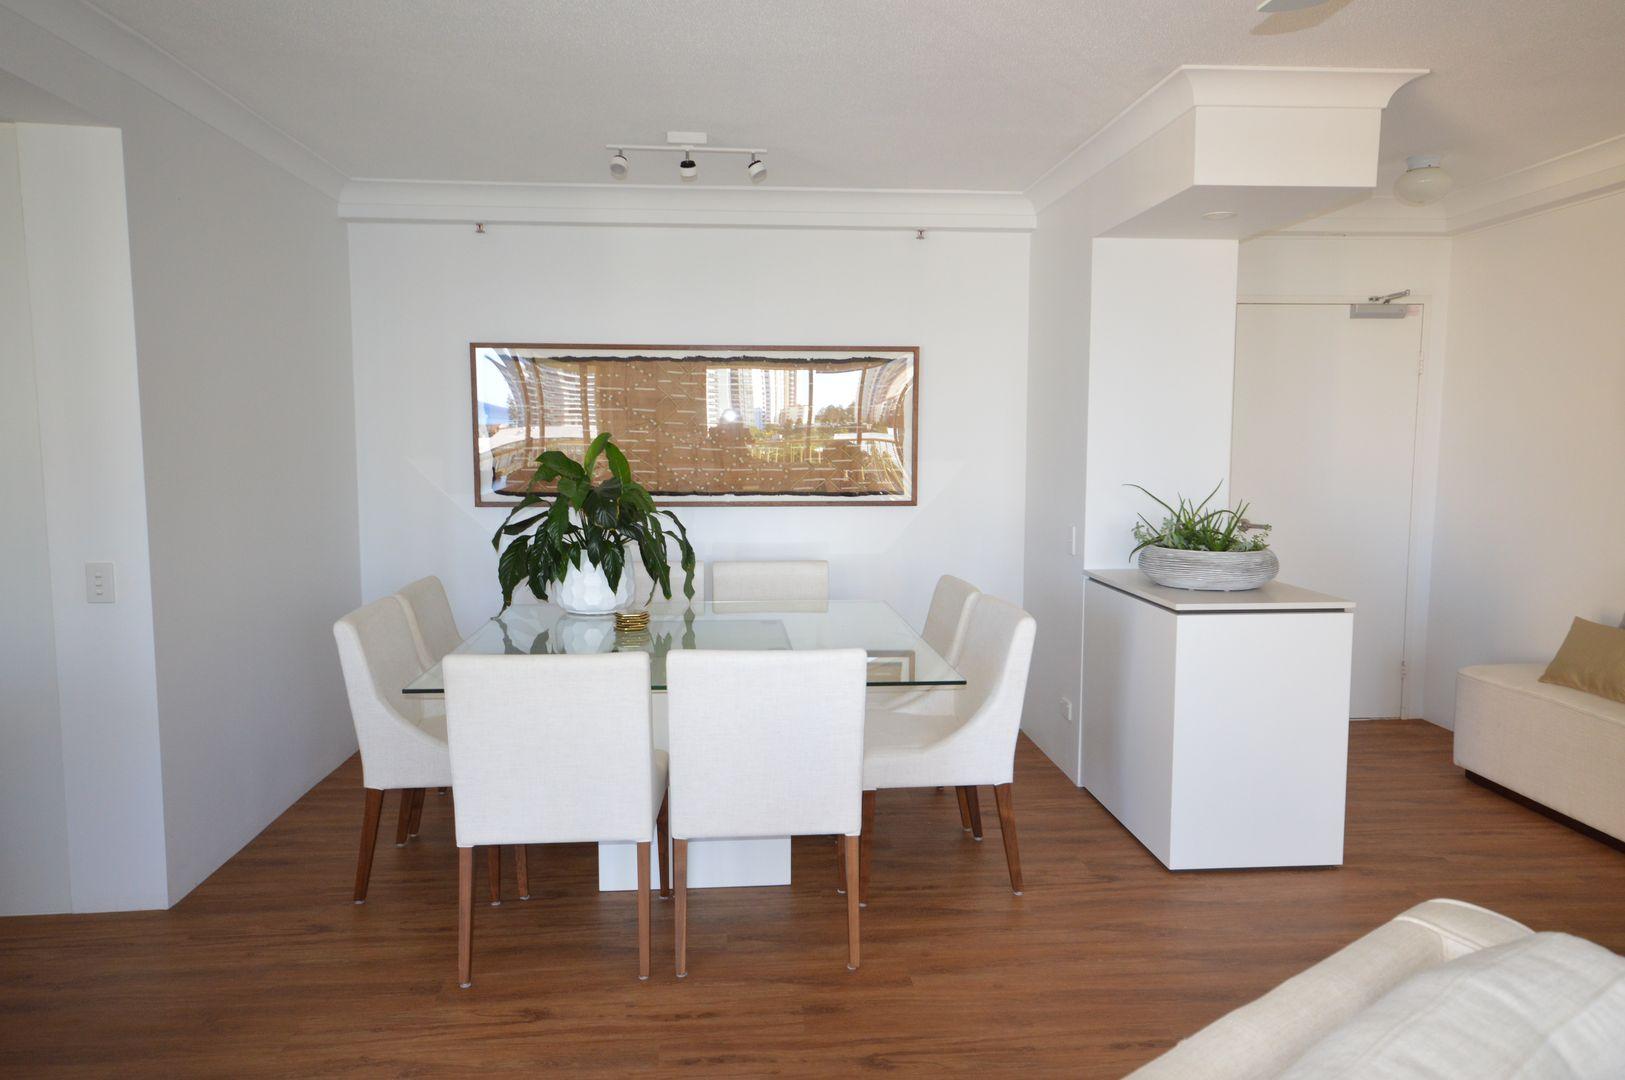 63/1 'Contessa' Serisier Ave, Main Beach QLD 4217, Image 1